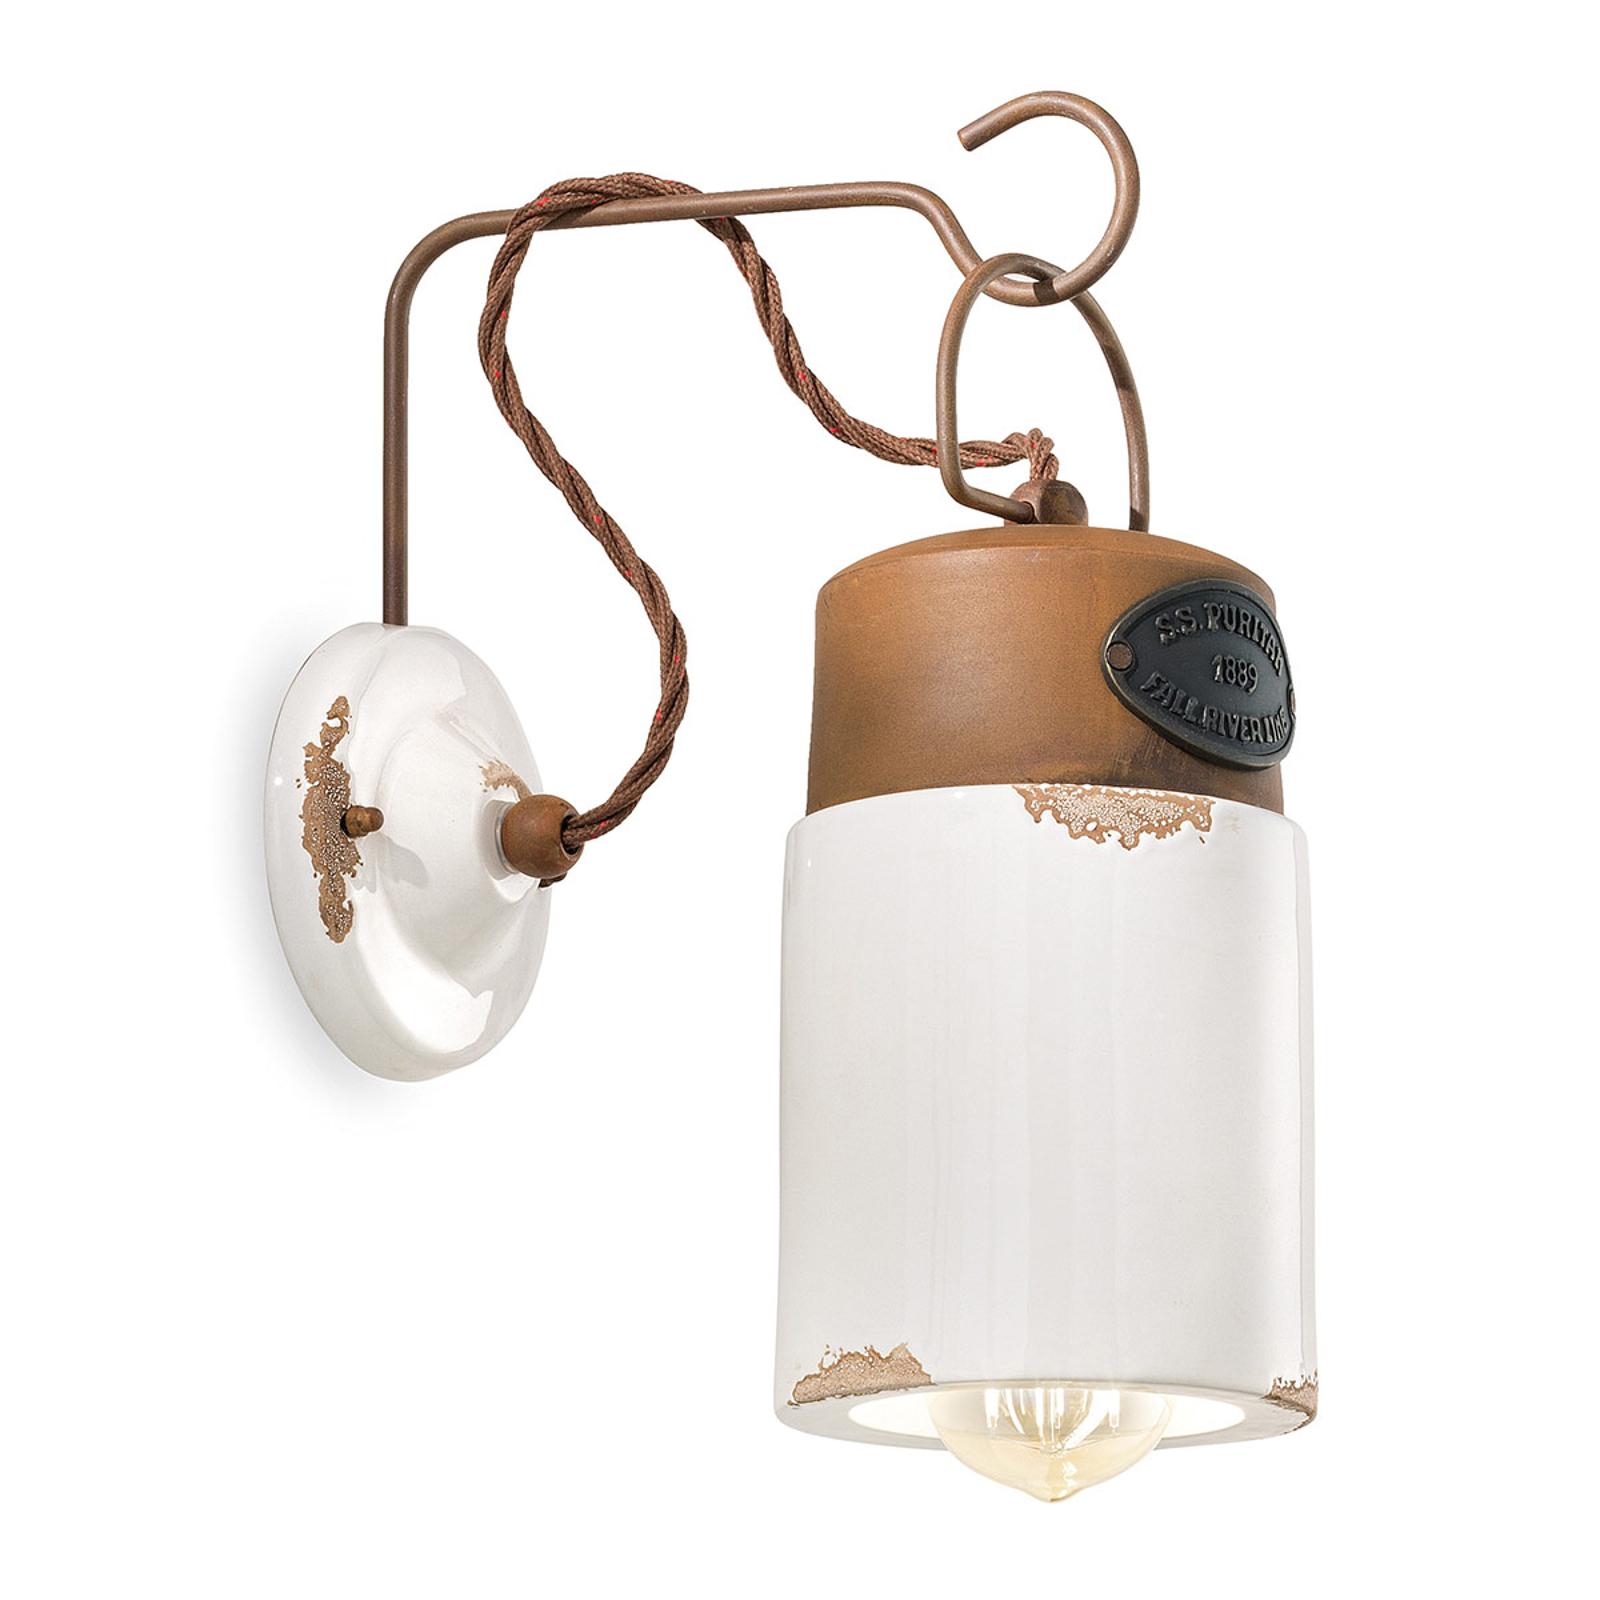 Wandlamp C1621, keramiek en metaal, wit